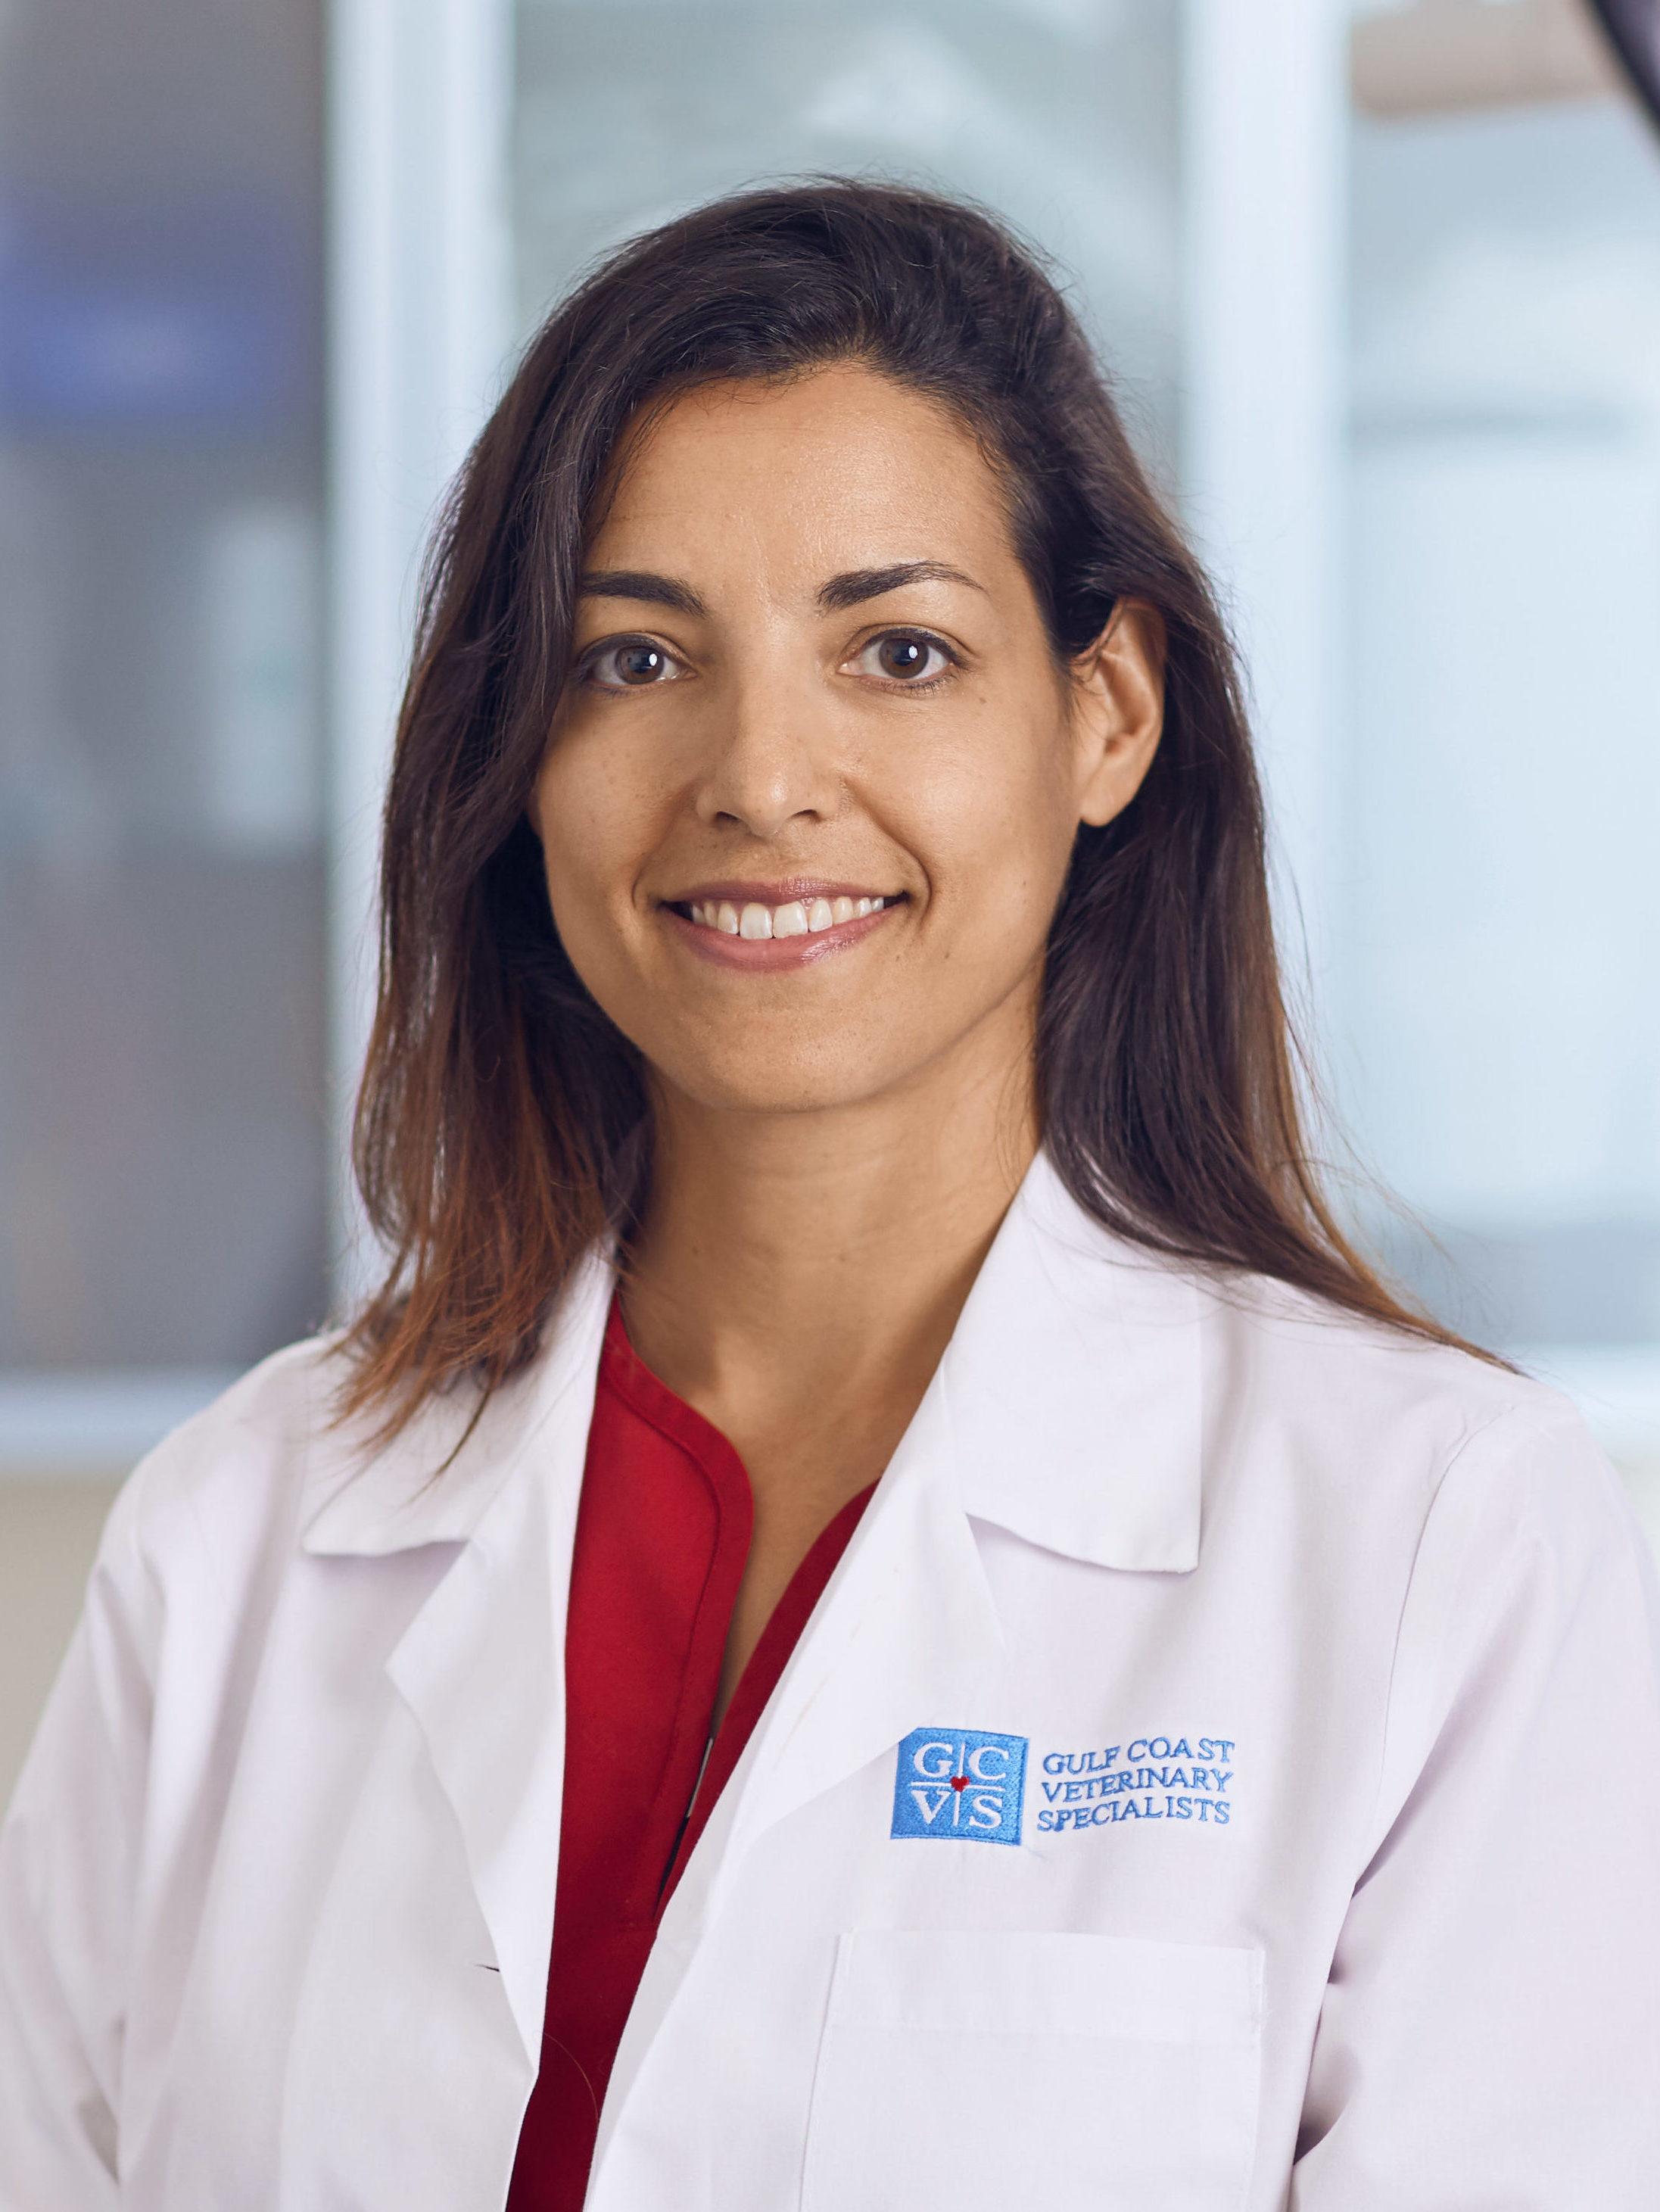 Carley Giovanella, DVM, DACVIM (Neurology)